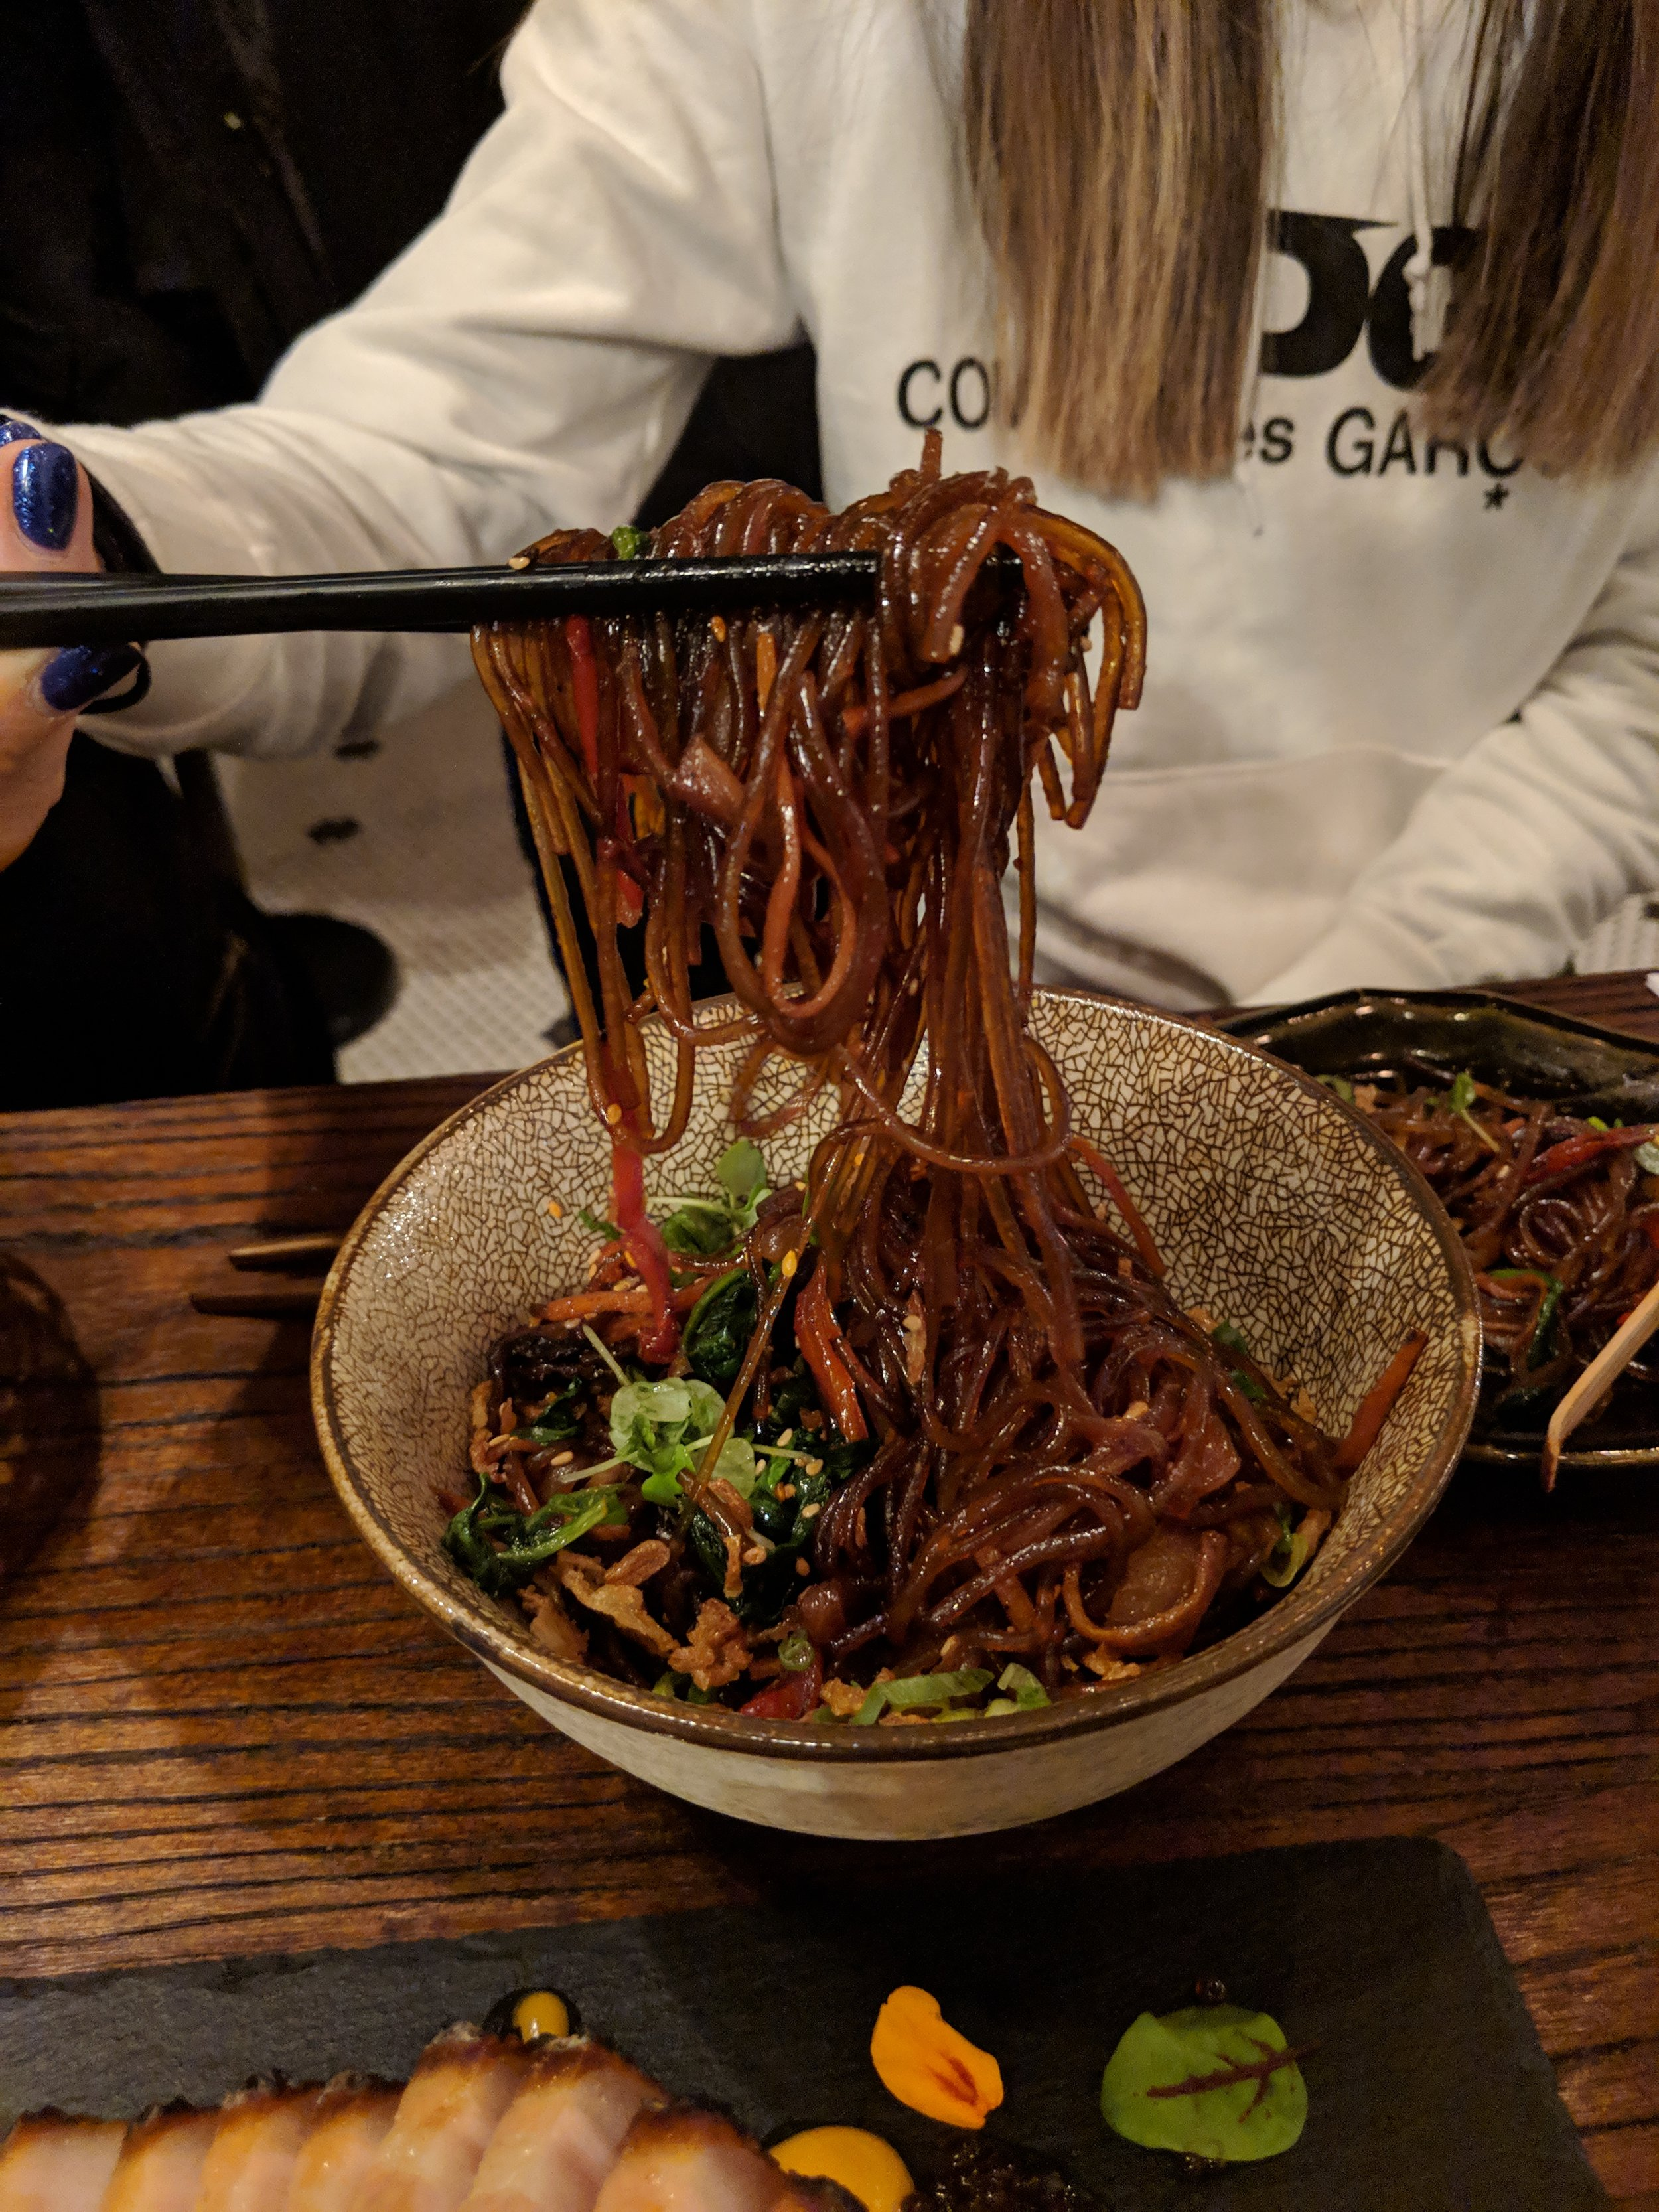 Japchae (Korean Stir Fried Glass Noodles)